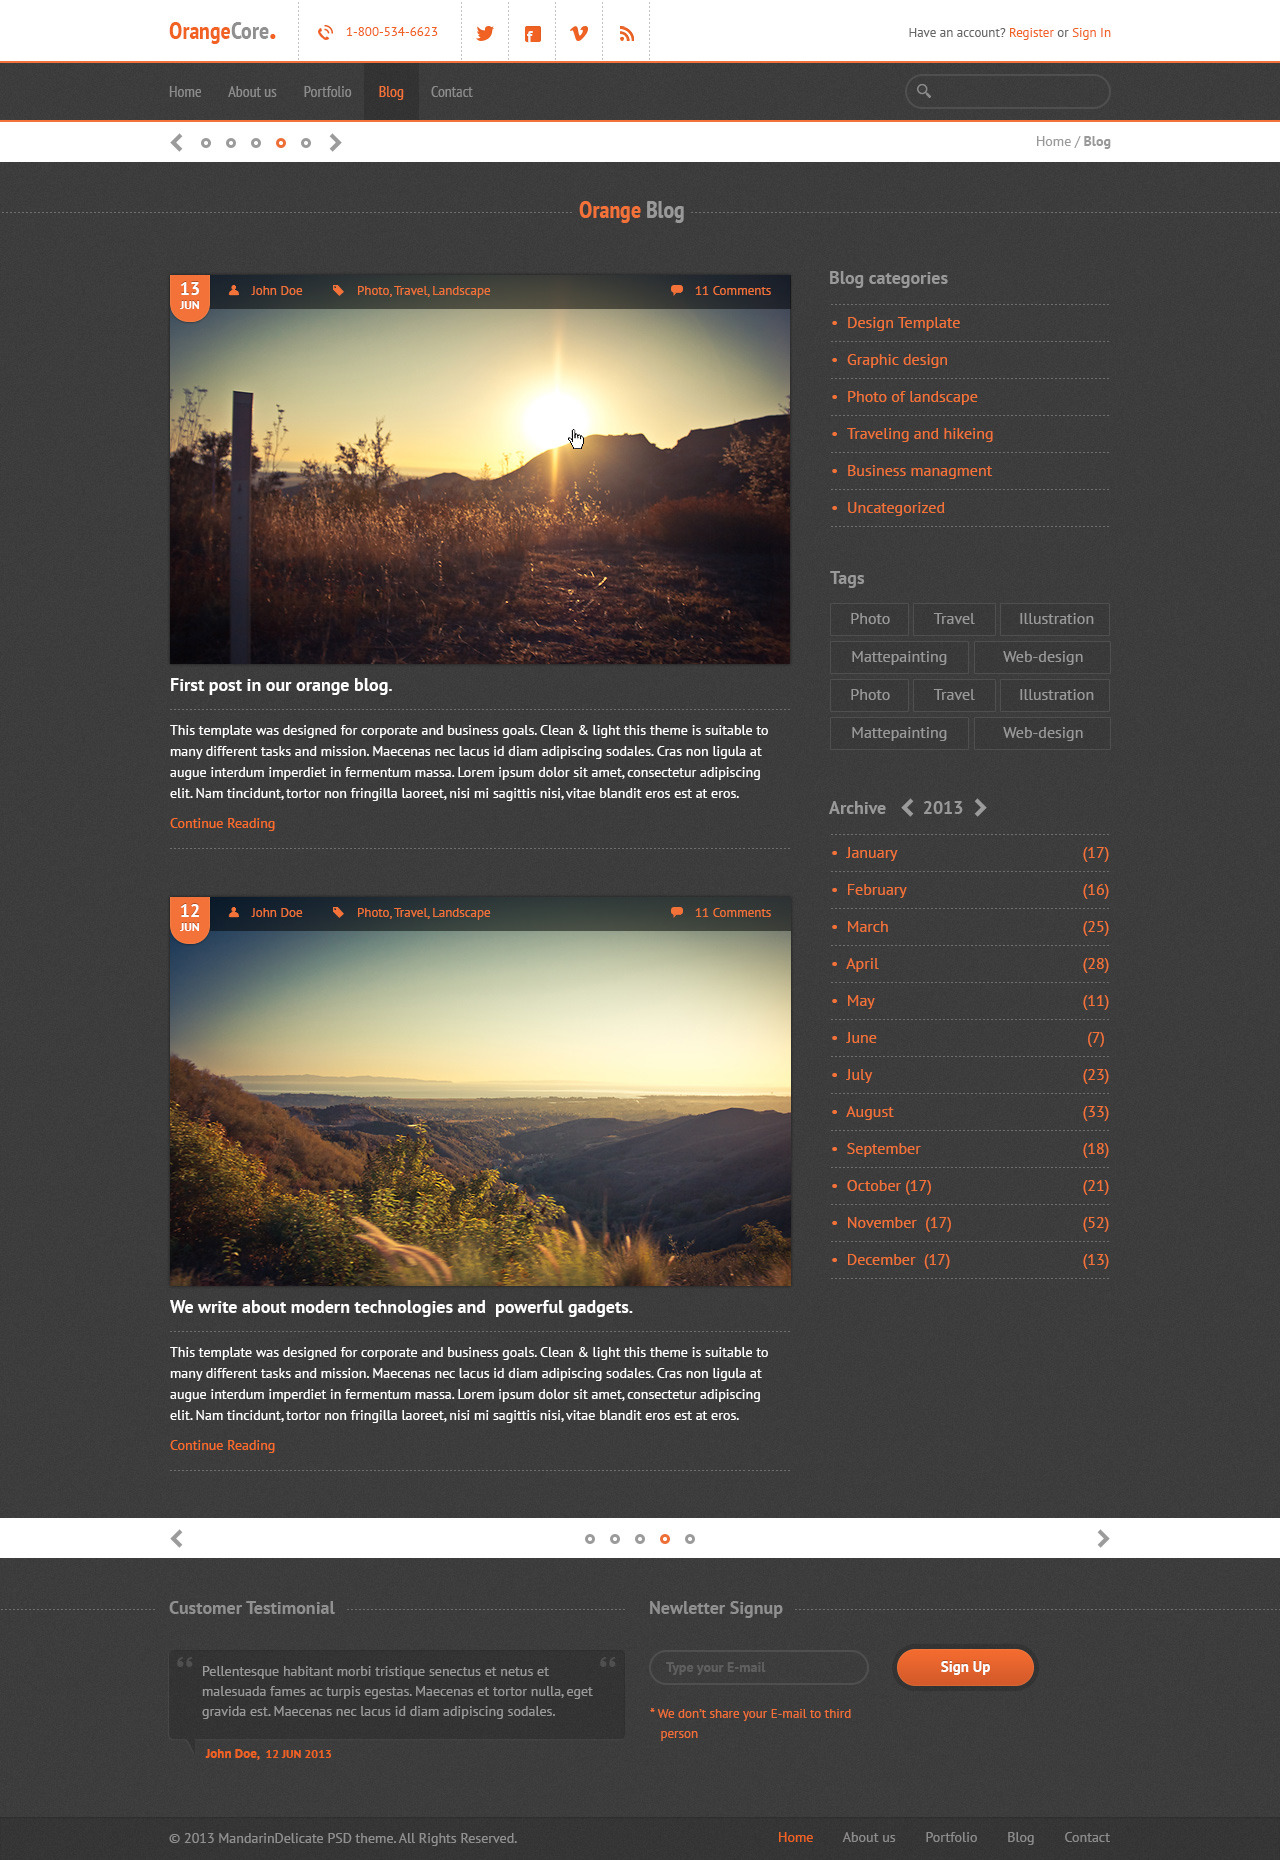 OrangeCore - PSD Template for Business Sites